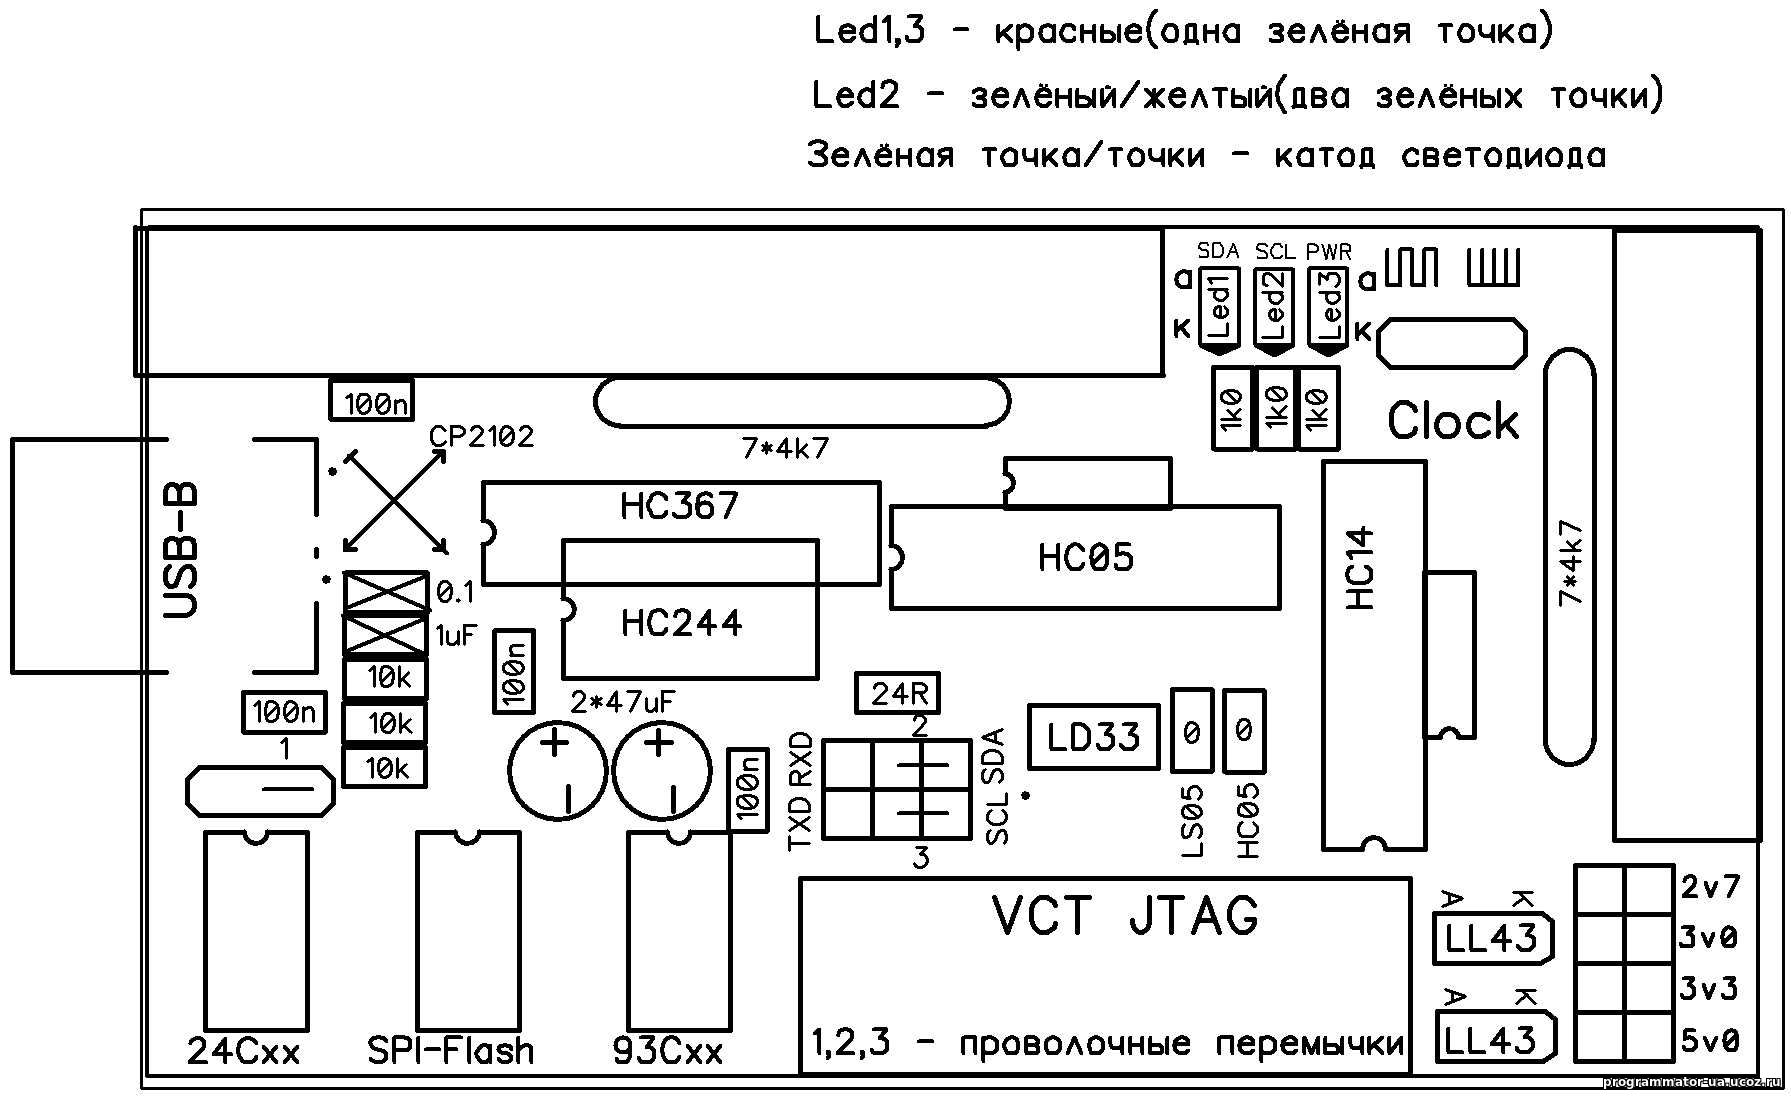 VCT JTAG для софта Postal2 - Мои файлы - Каталог файлов ...: http://programmator-ua.ucoz.ru/load/jtag_postal2/1-1-0-3